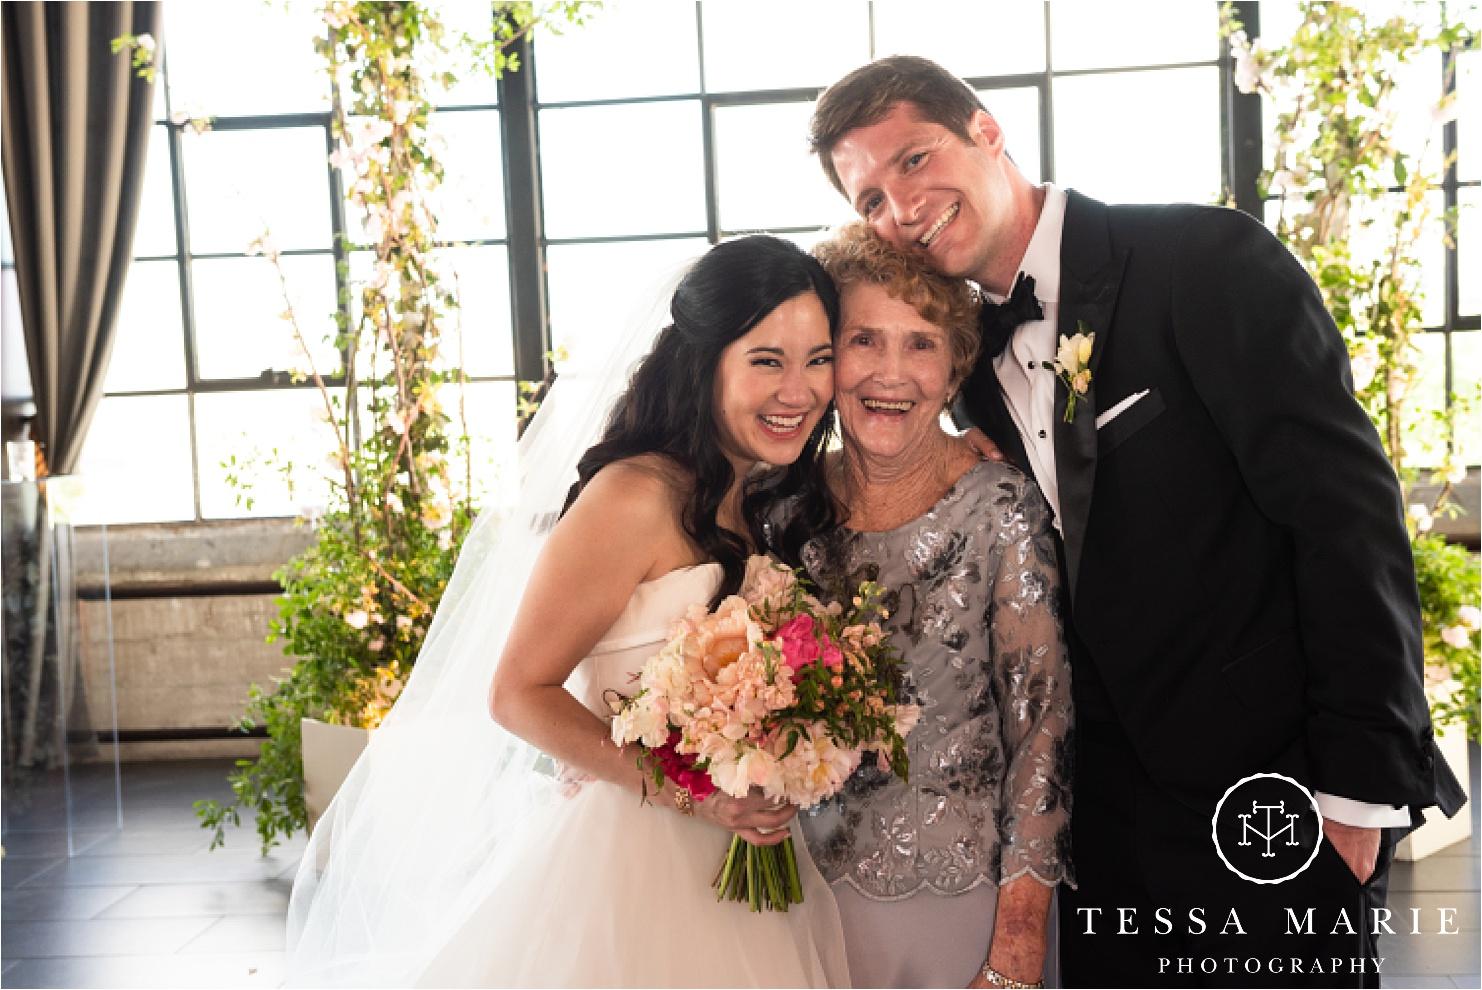 Tessa_marie_weddings_houston_wedding_photographer_The_astorian_0133.jpg